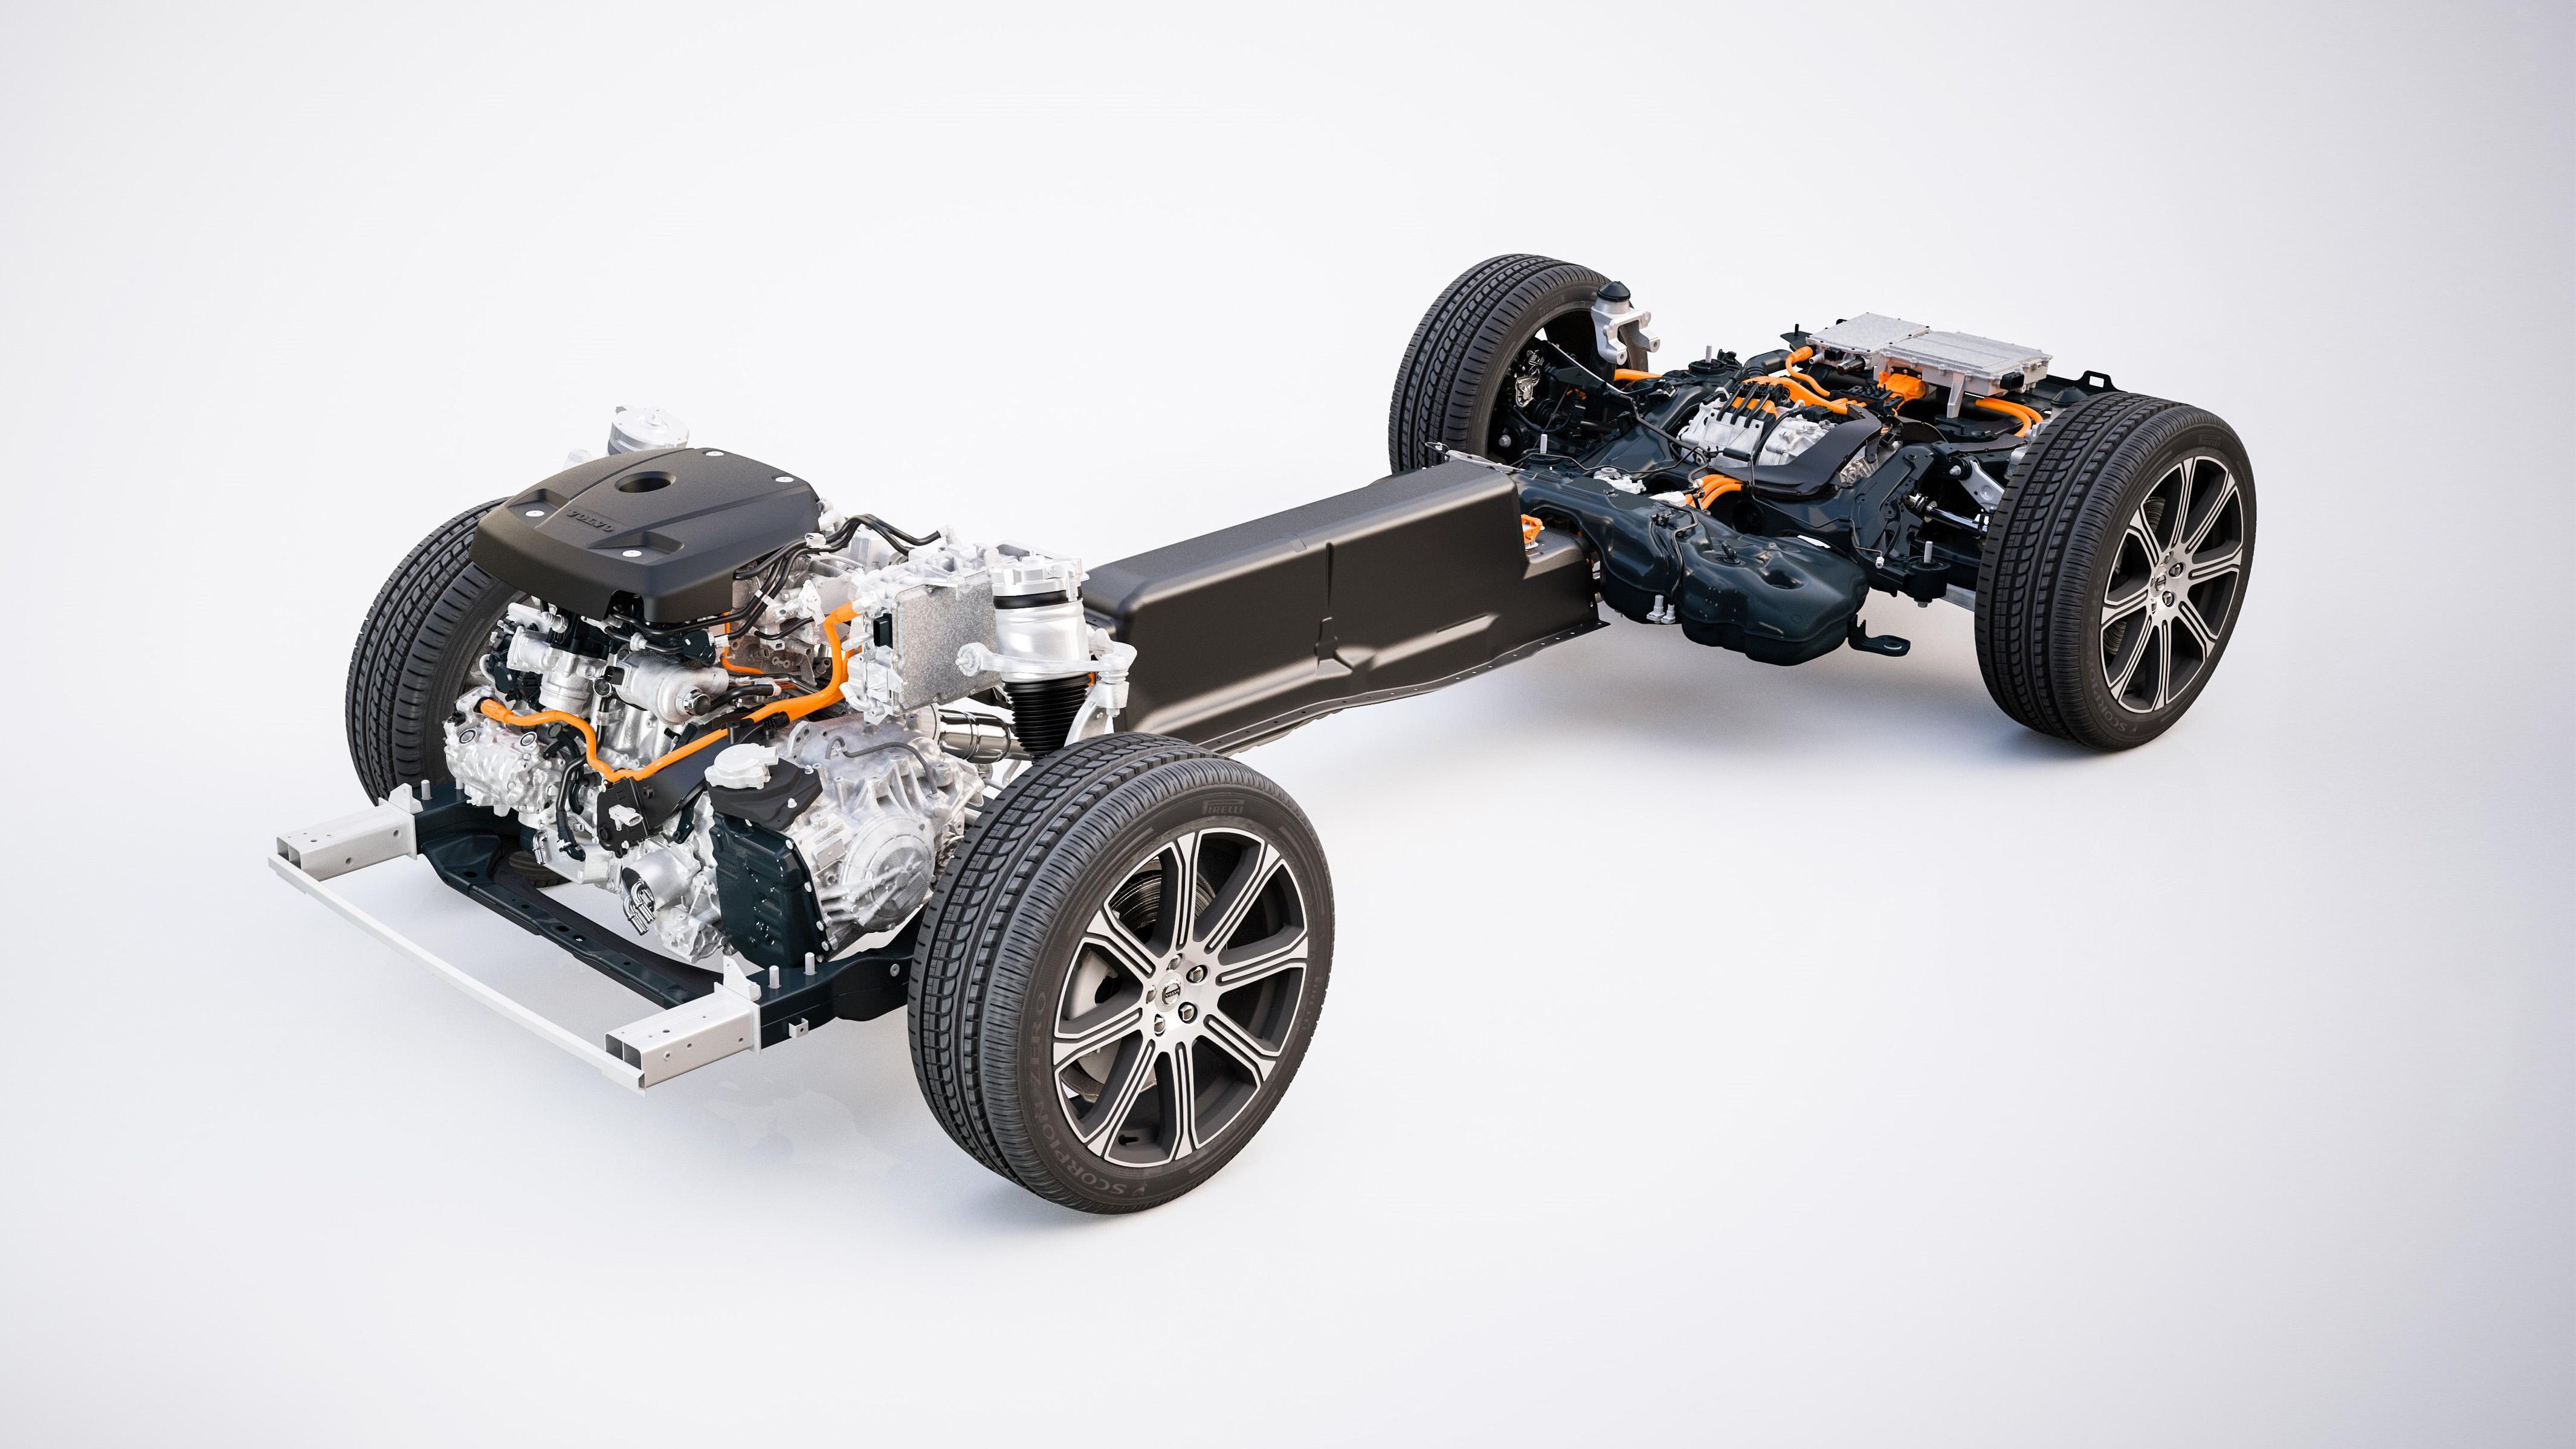 Volvo XC60 powertrain